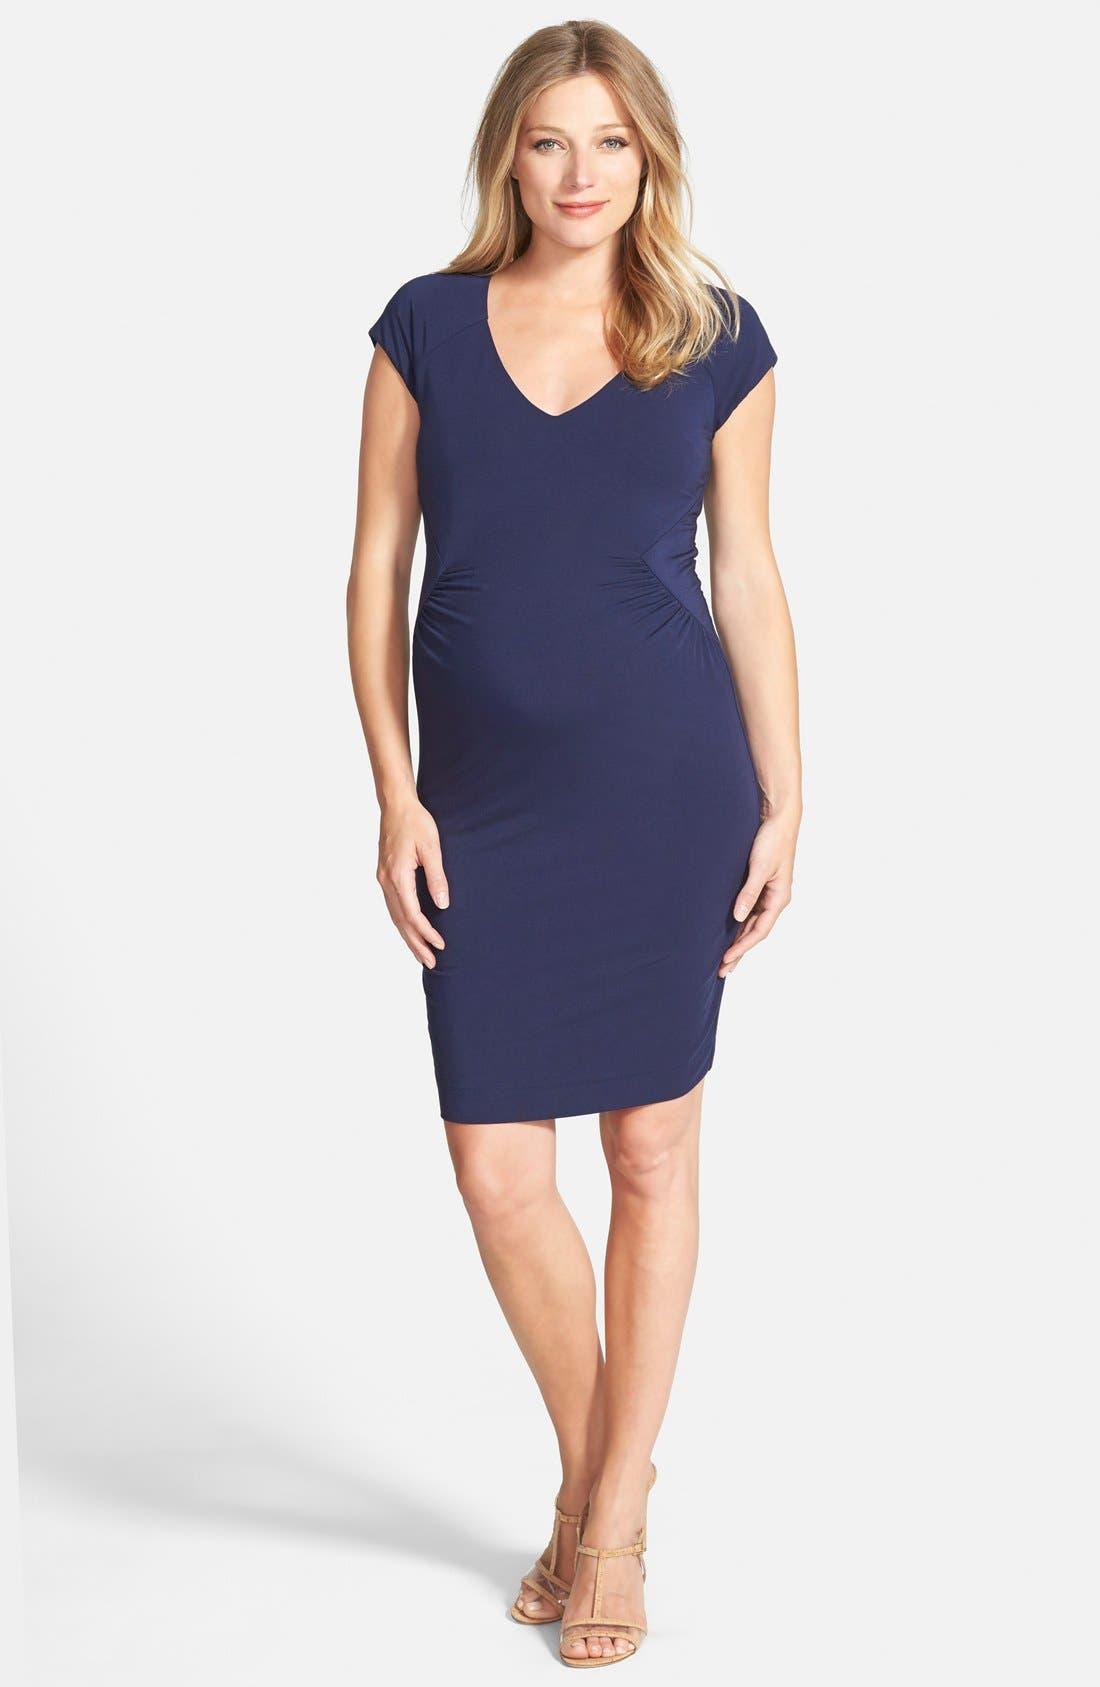 Alternate Image 1 Selected - Tart Maternity 'Freya' Print Body-Con Maternity Dress